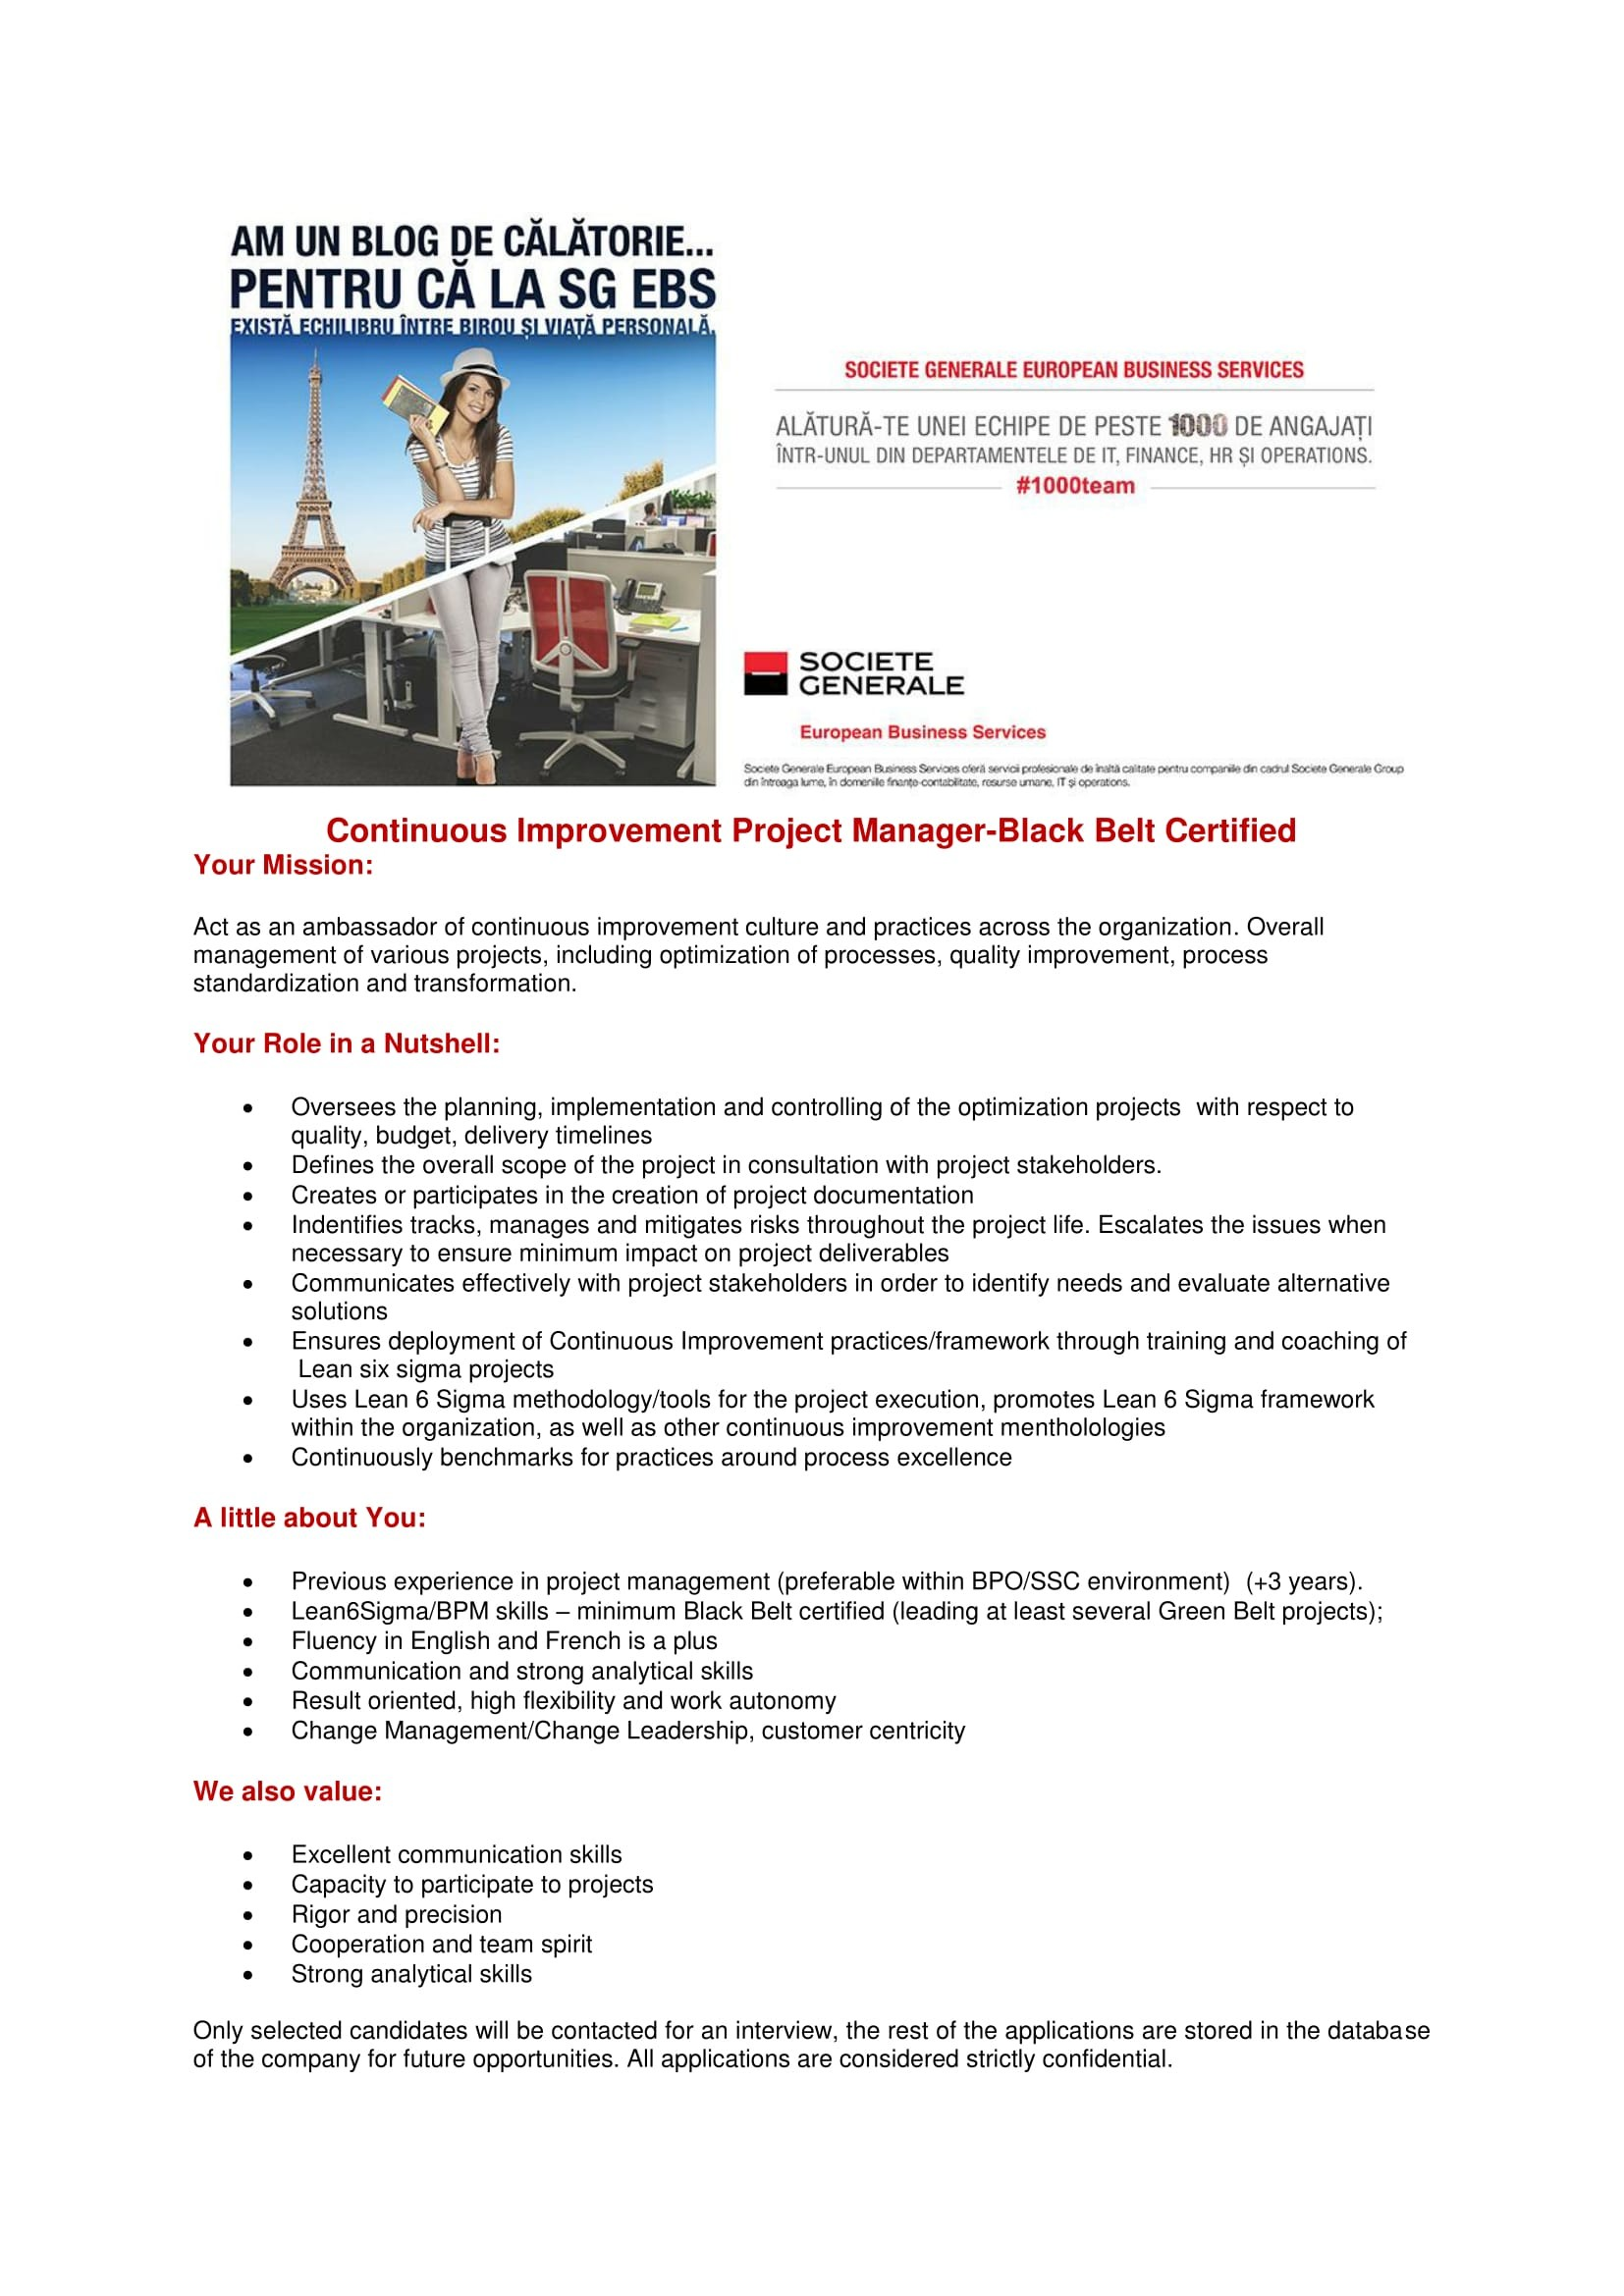 Continuous Improvement Project Manager Black Belt-site EBS-1